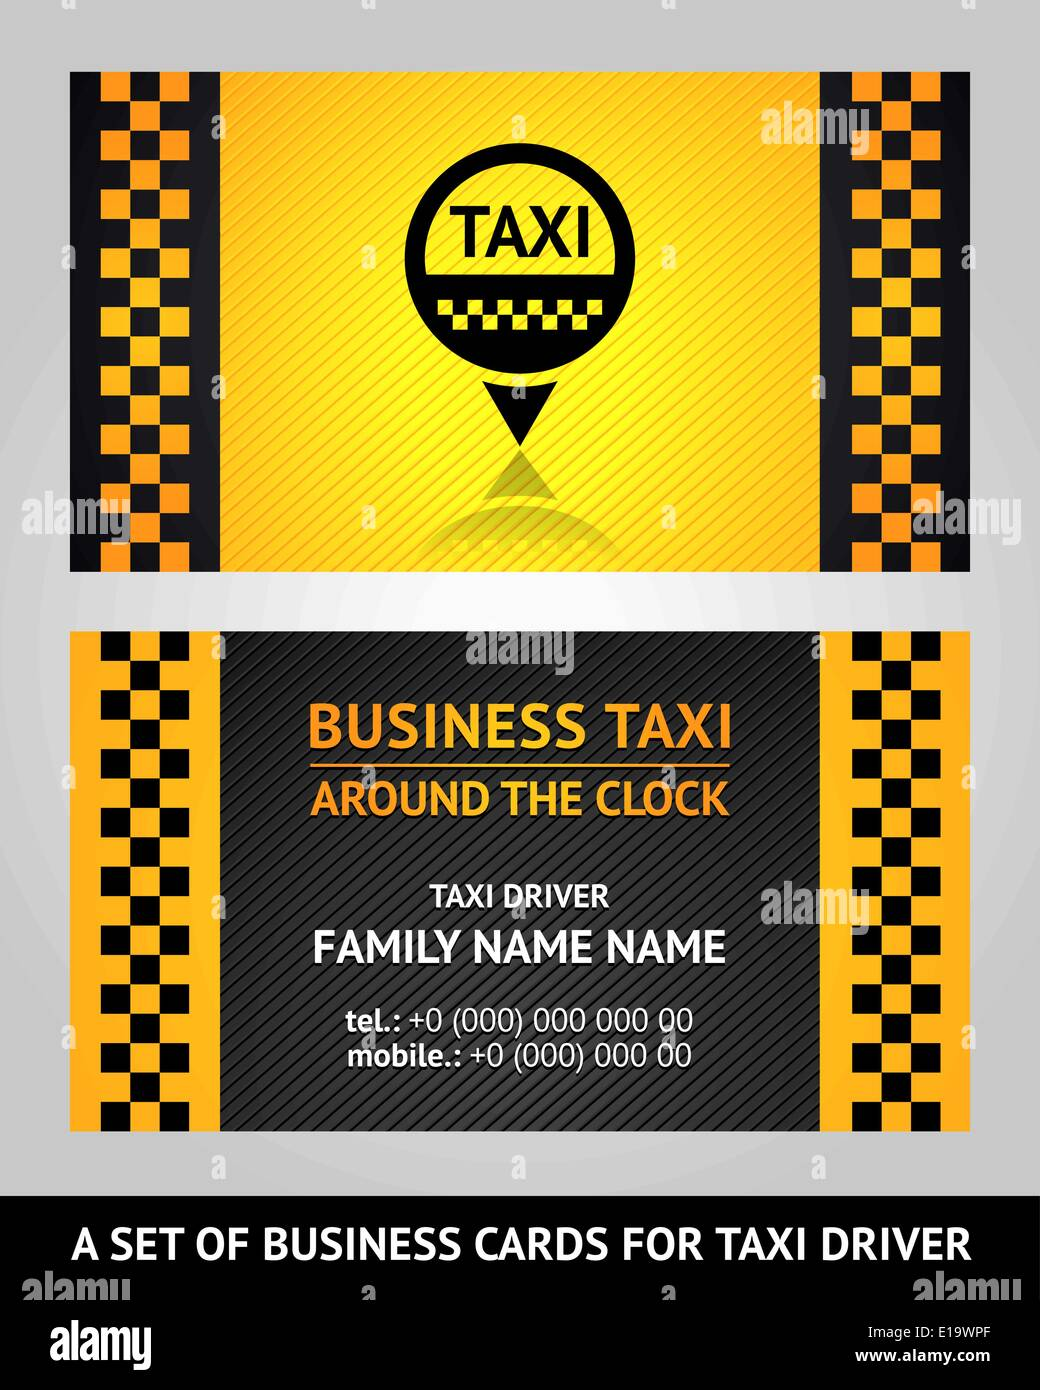 Visitenkarten Taxi Vektor Illustration Vorlage 10eps Vektor